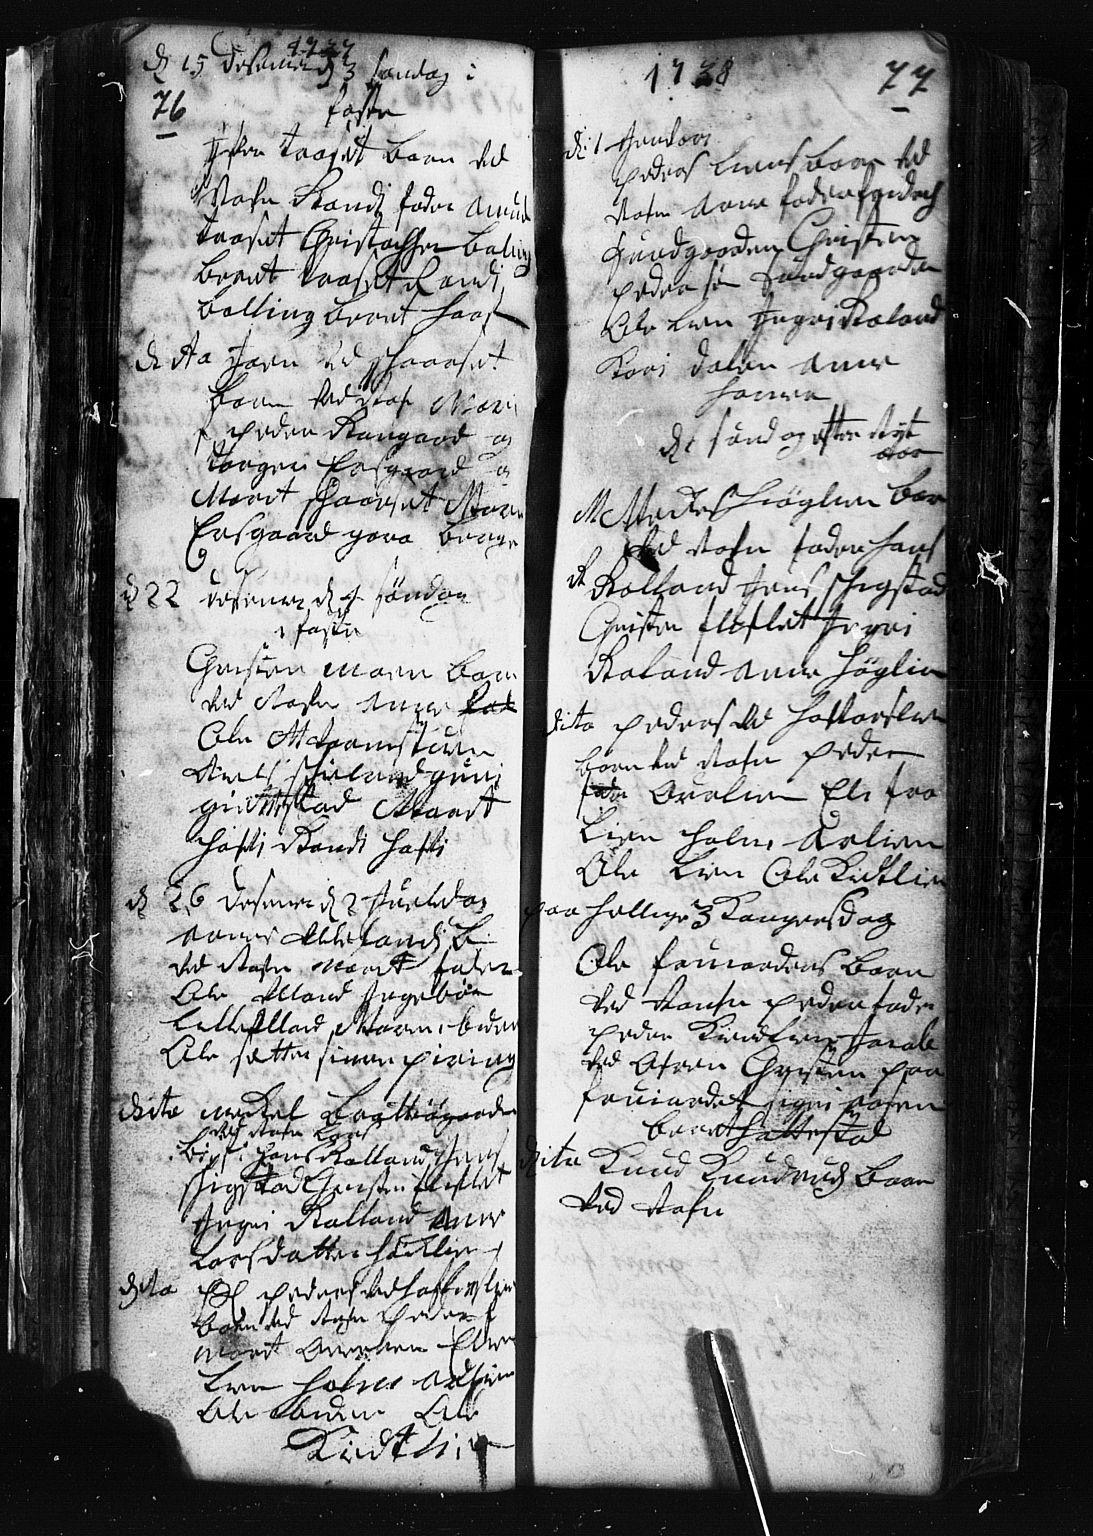 SAH, Fåberg prestekontor, Klokkerbok nr. 1, 1727-1767, s. 76-77